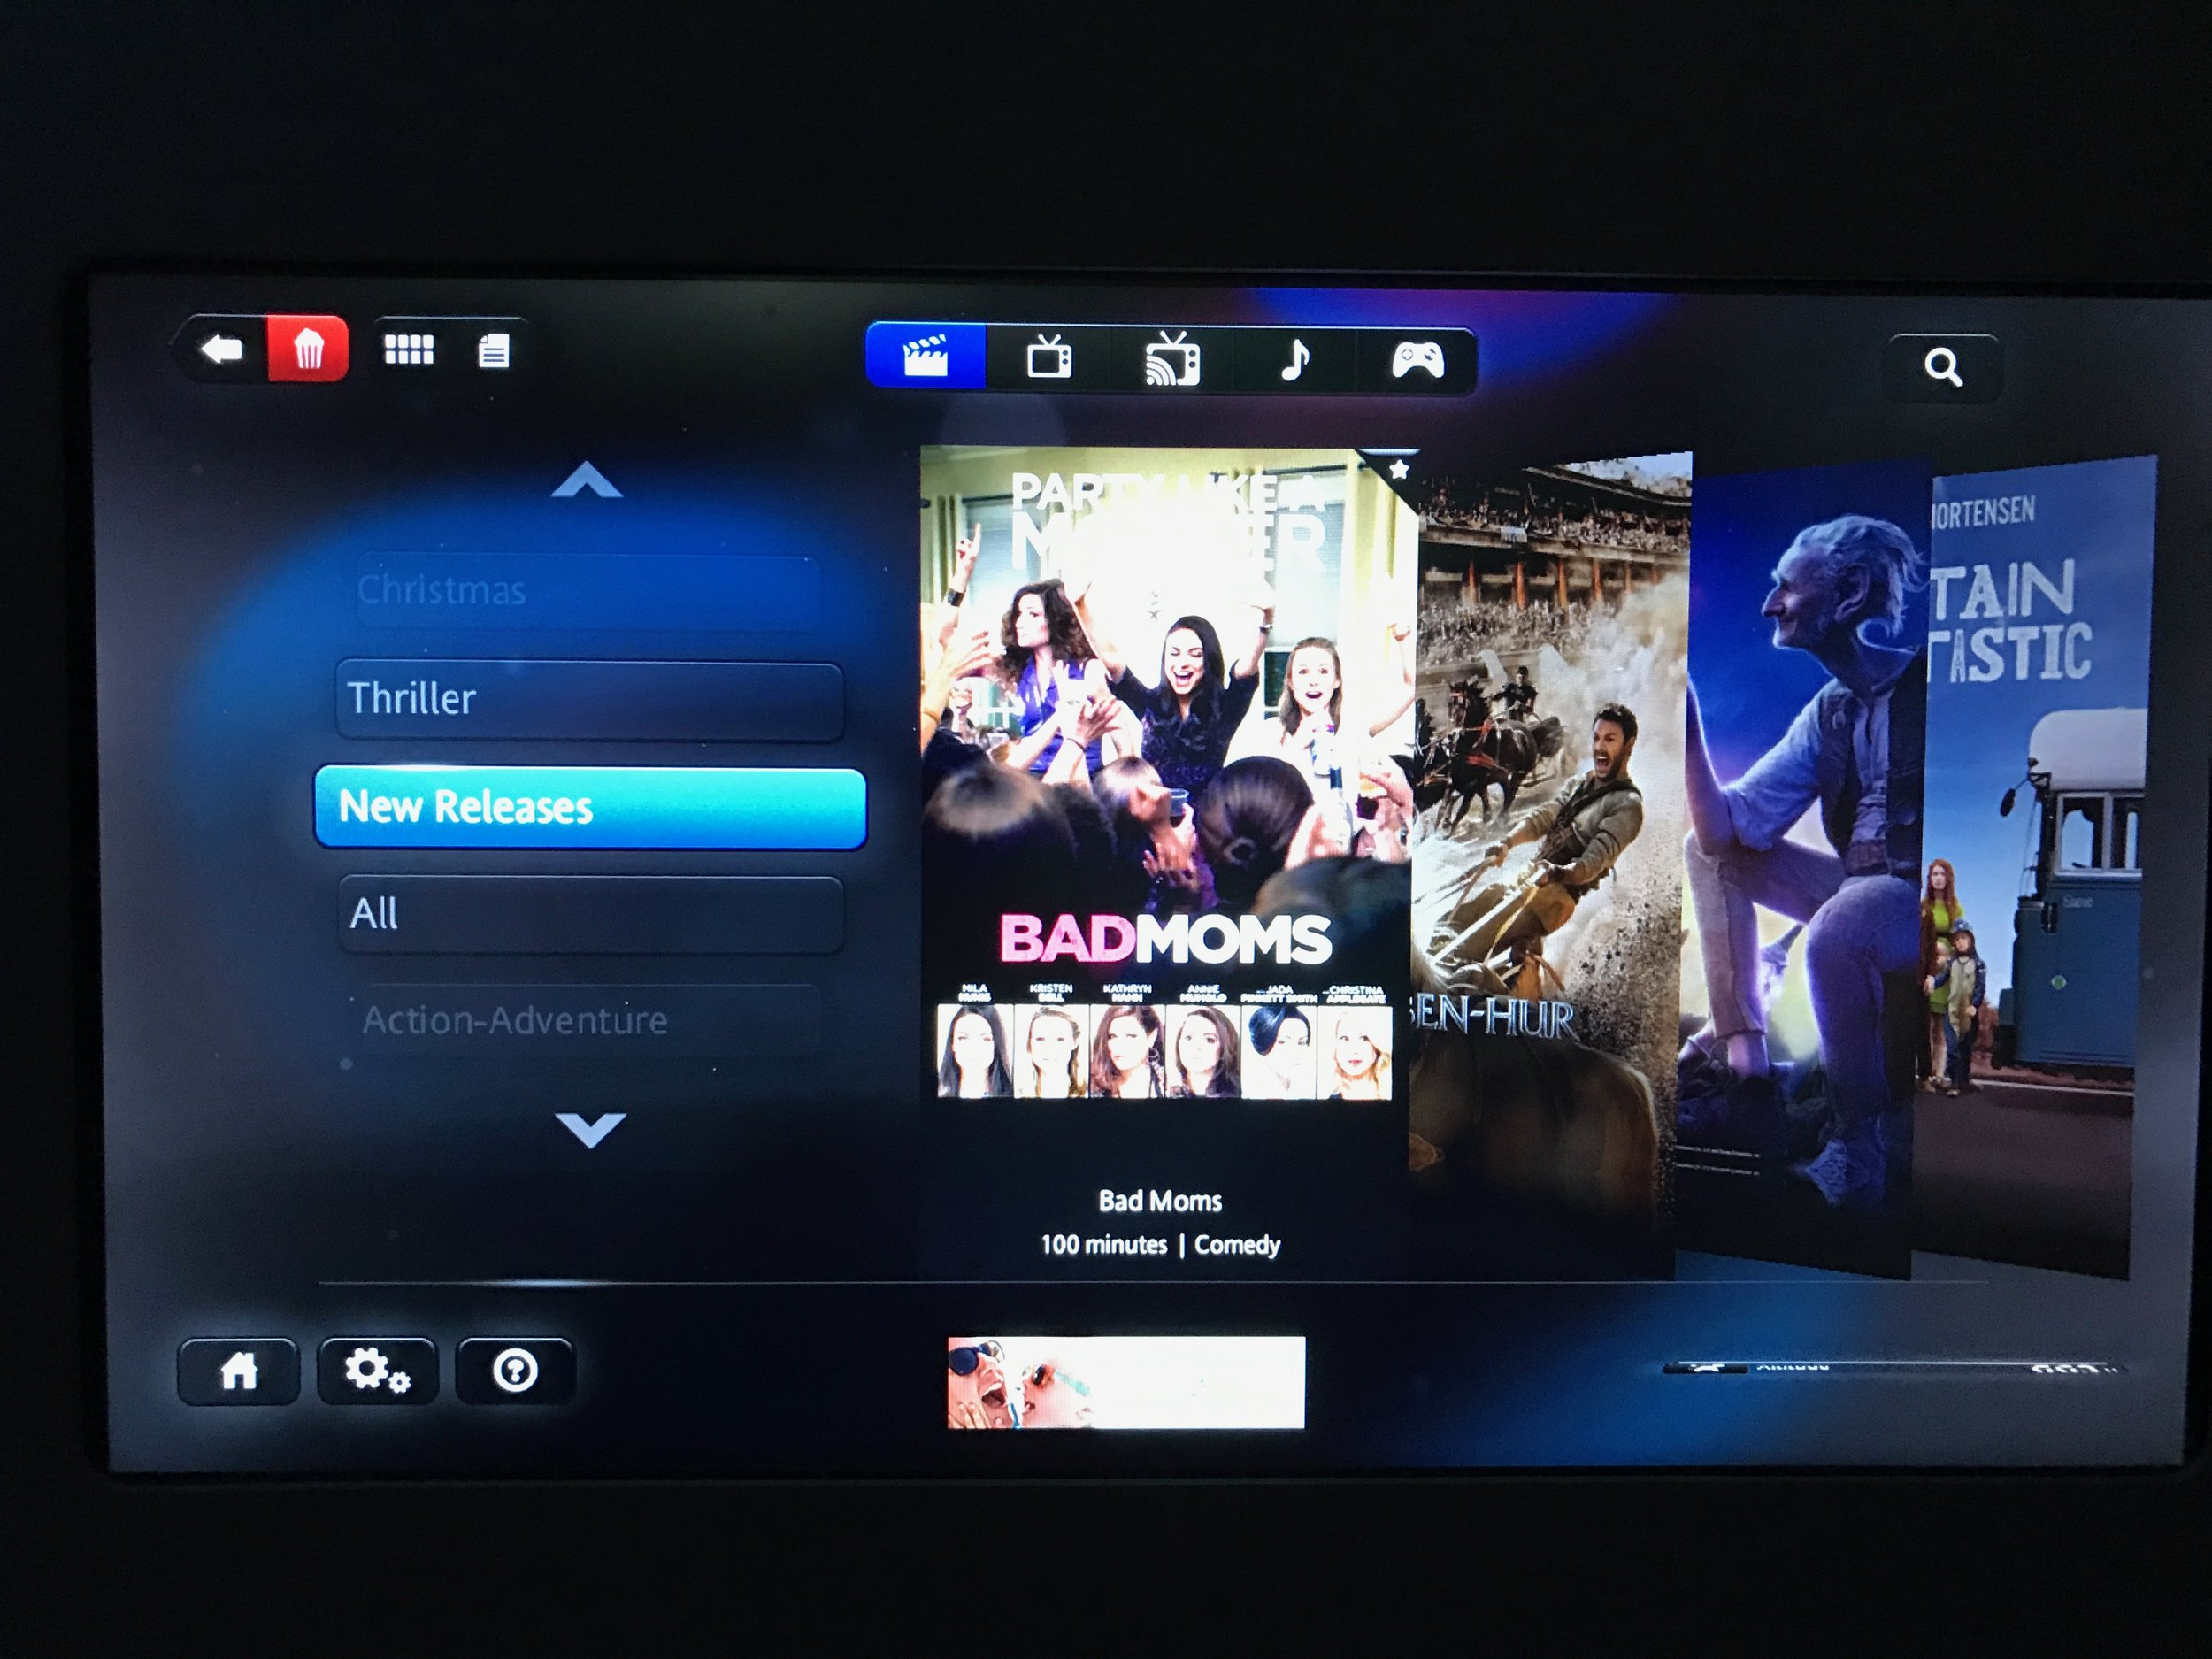 AA 787 Dreamliner Business Class IFE HD touchscreen monitor